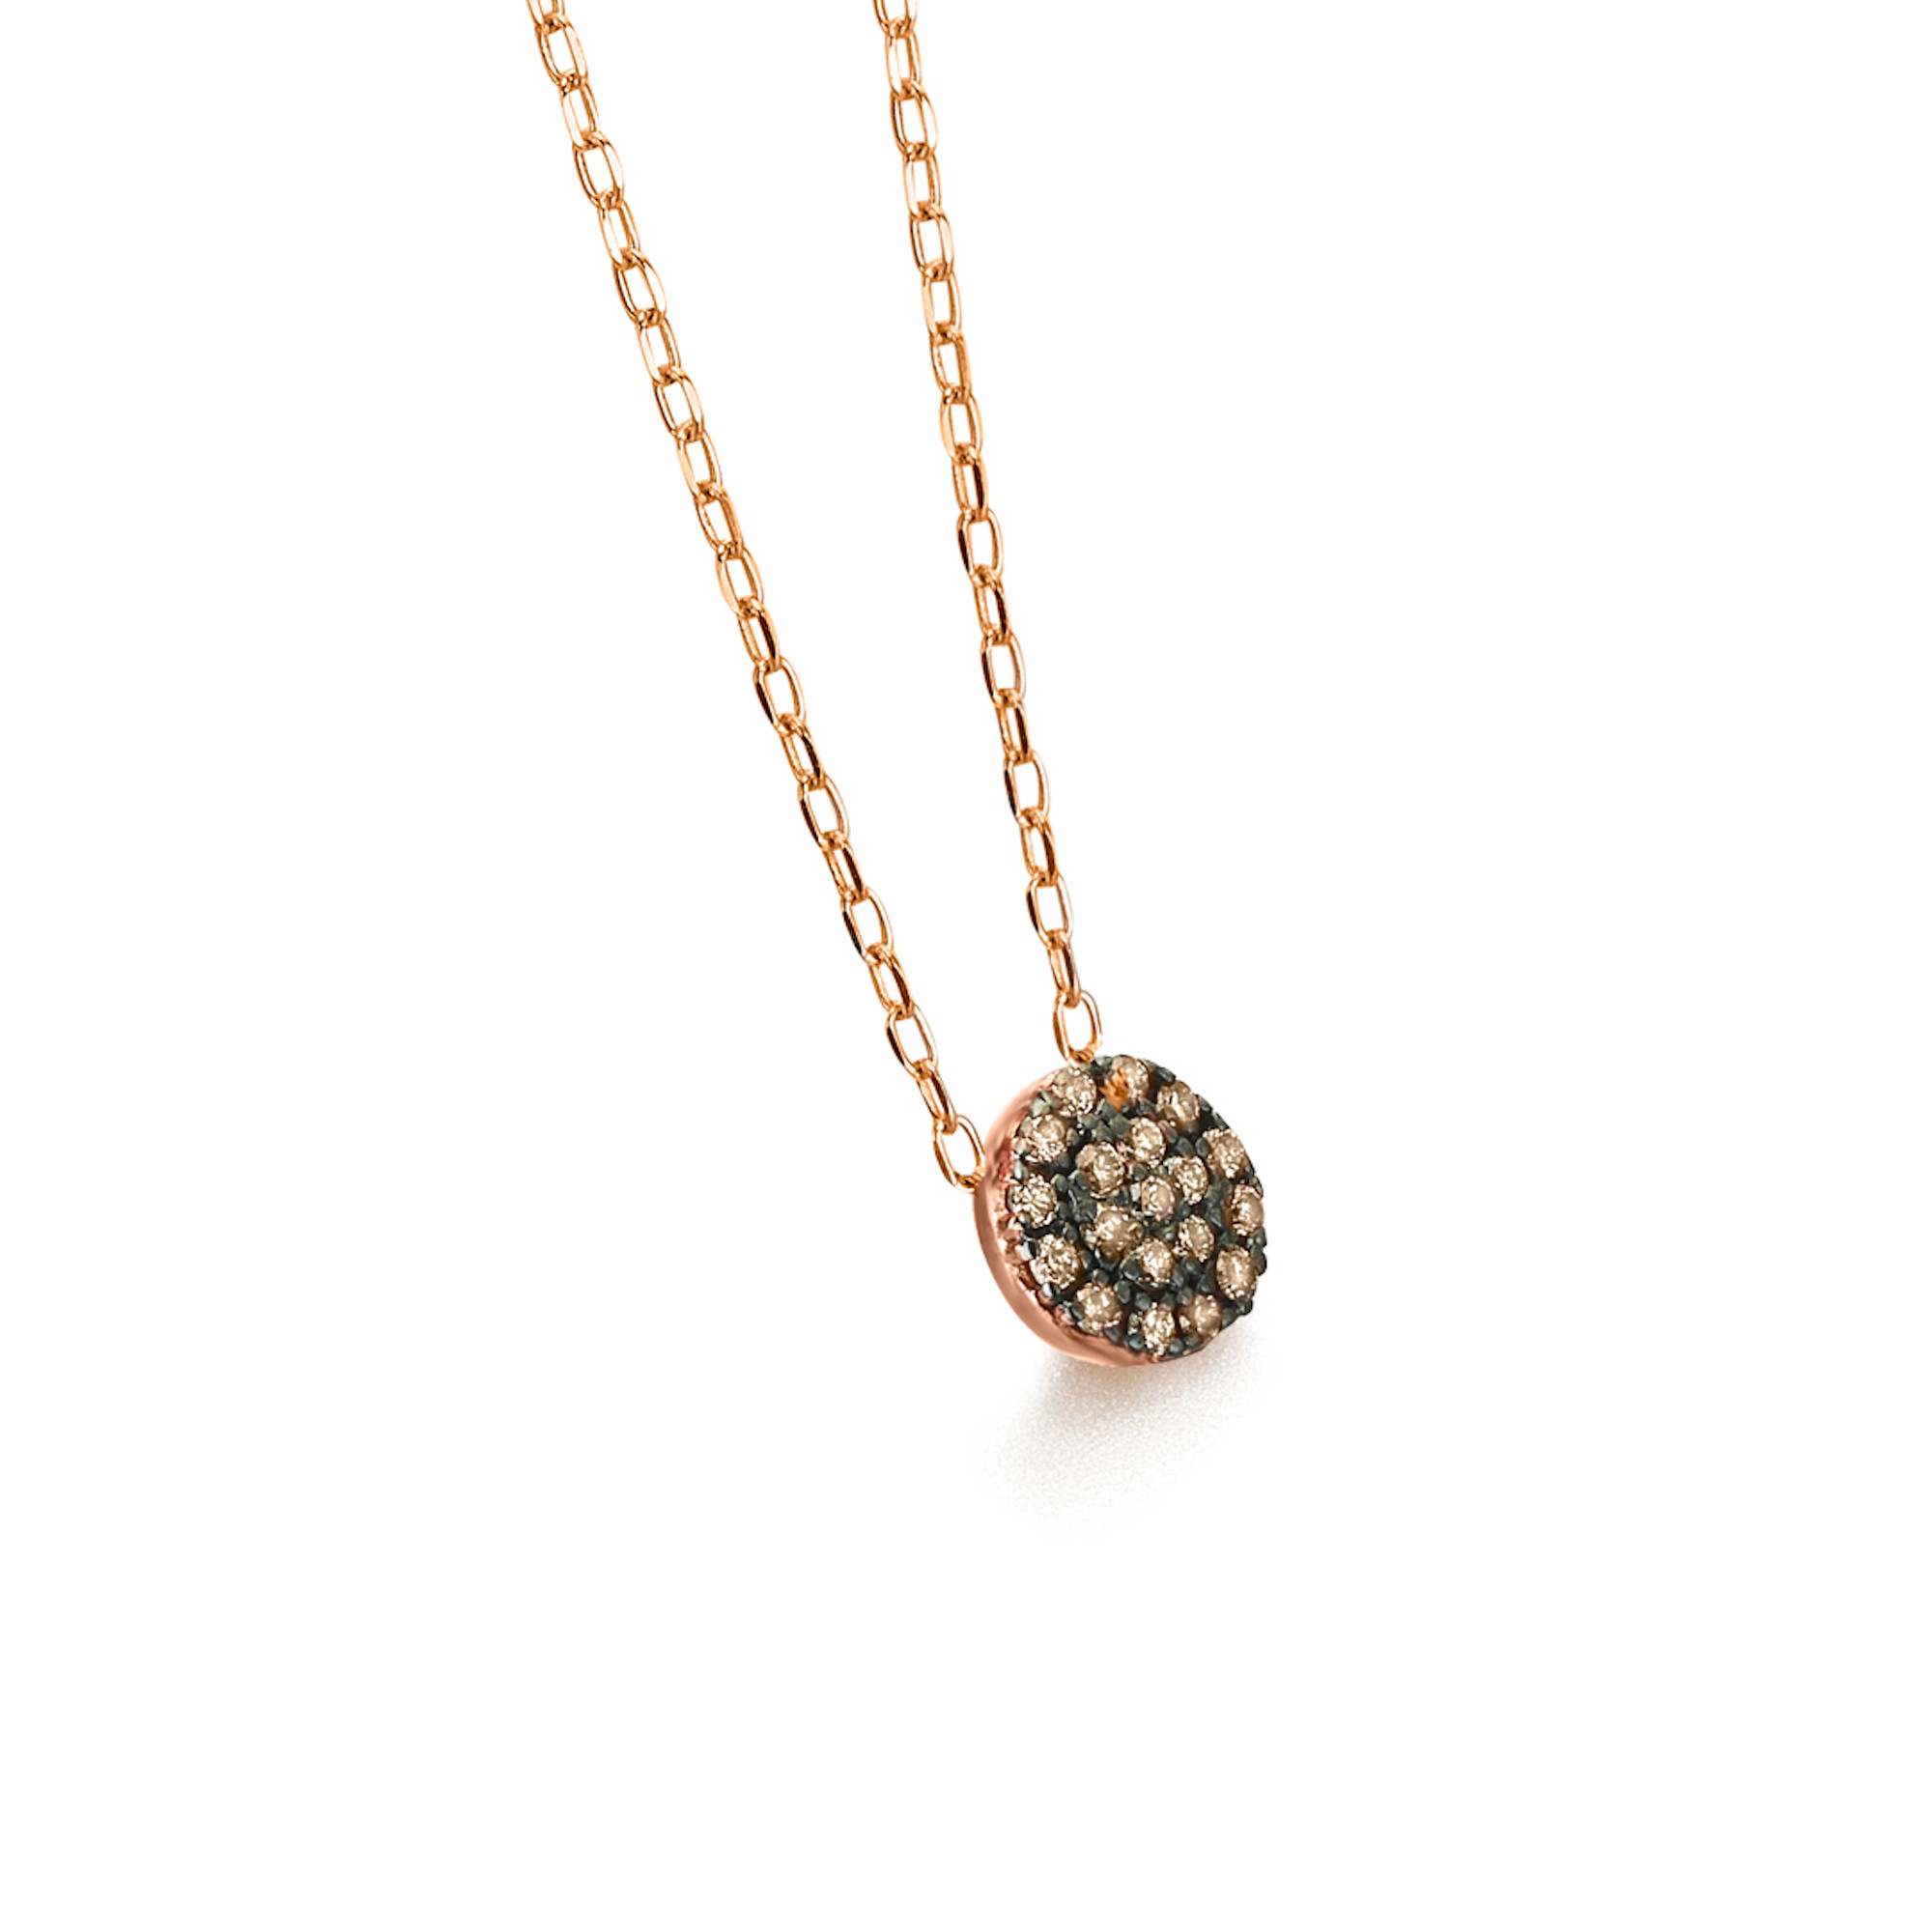 GD073OR-BR collana or rosa diamanti brown necklace diamonds discount